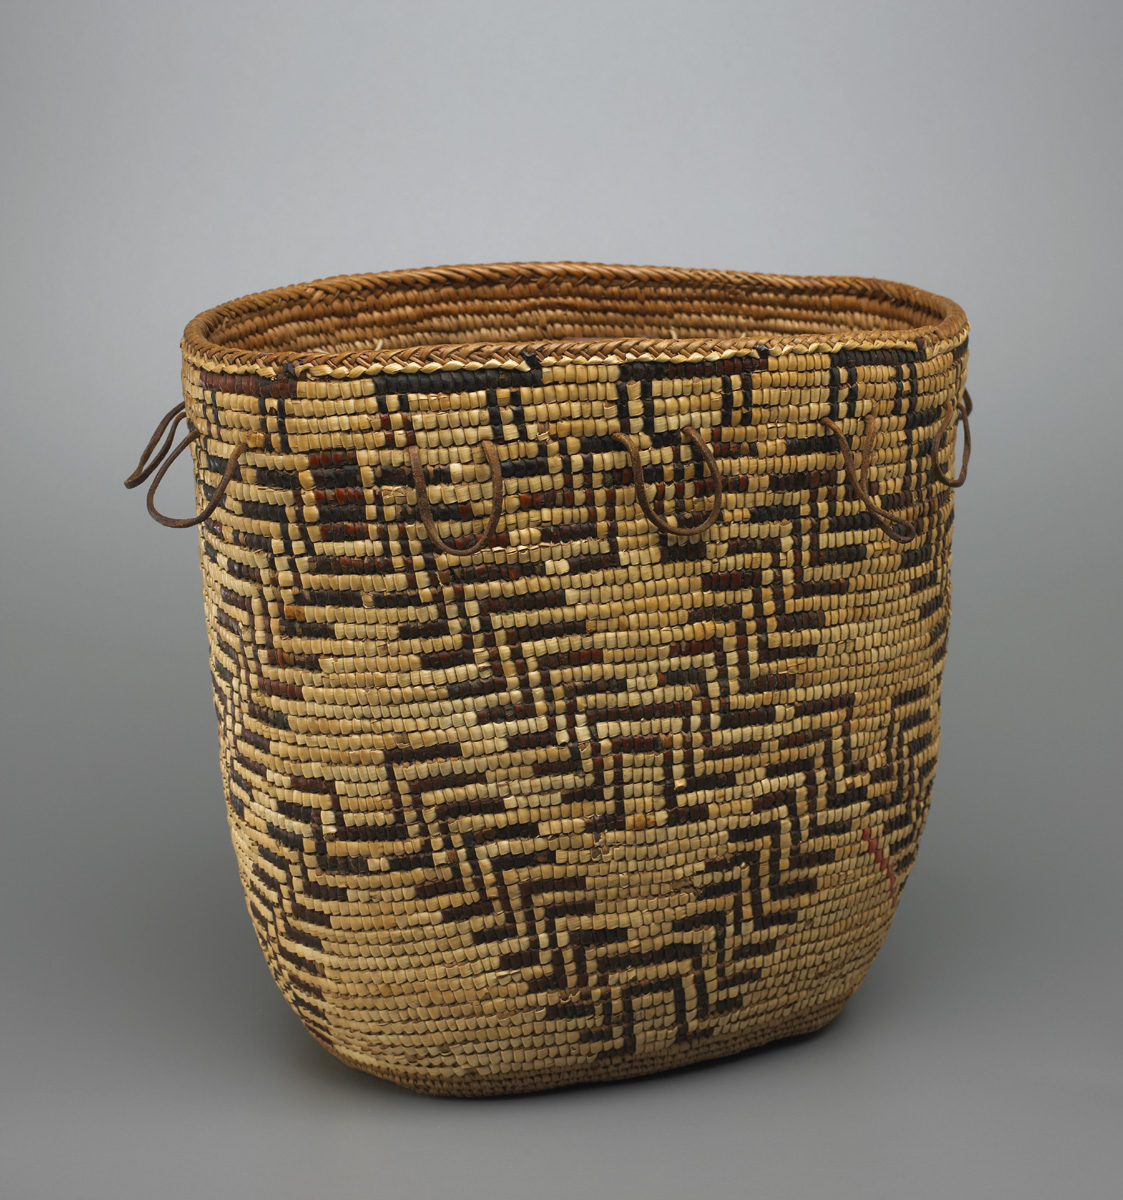 SAM Art: One last traditional basketmaker